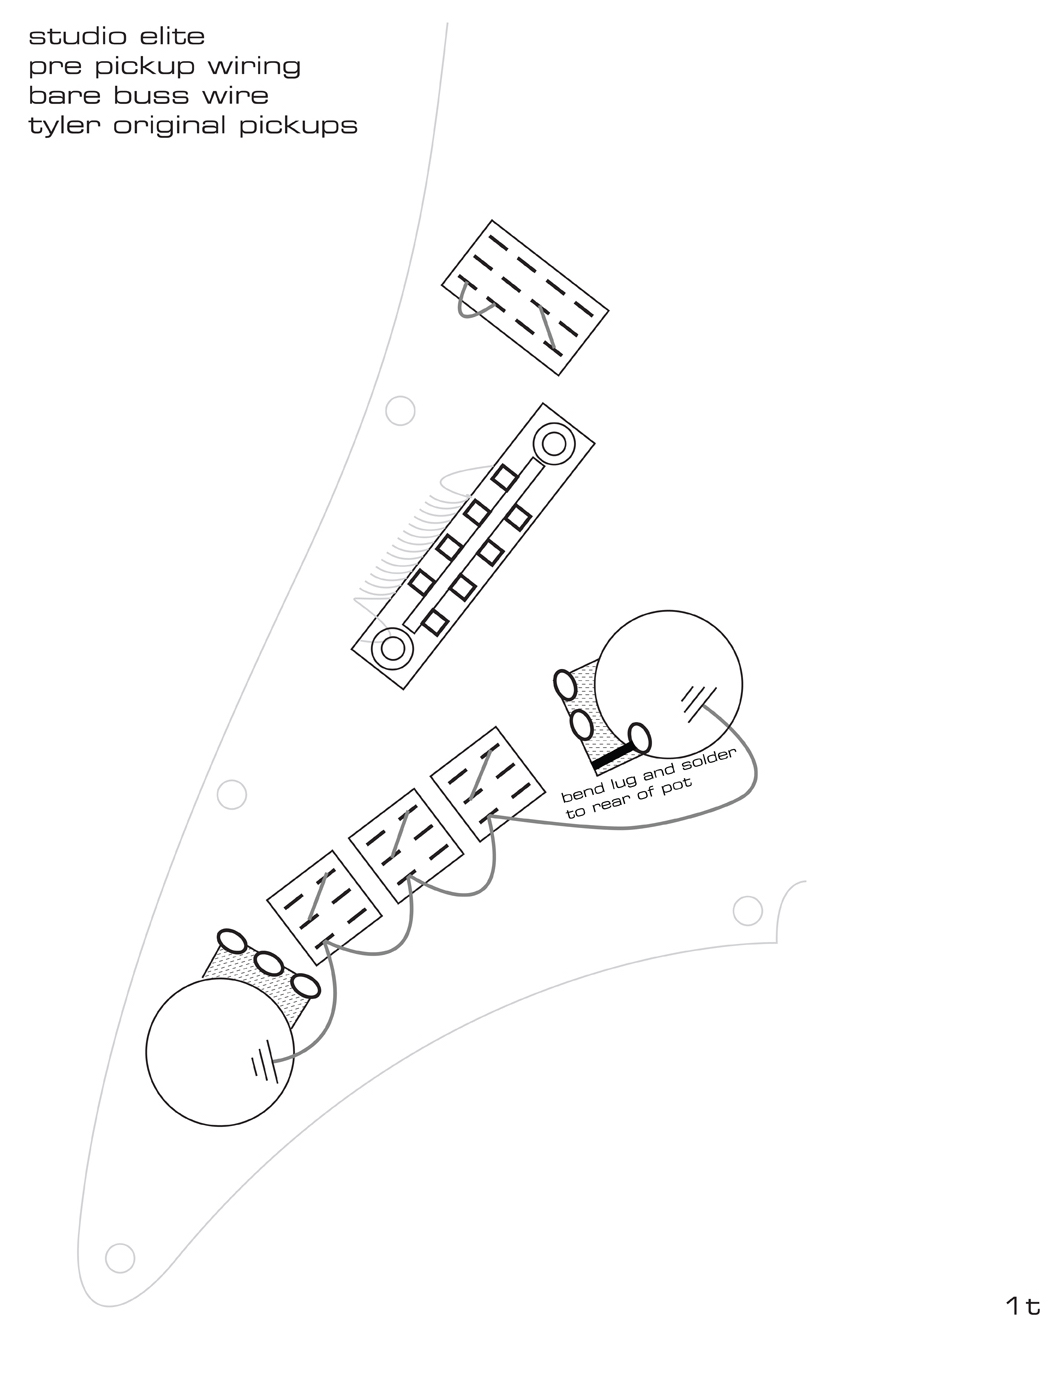 SE JTO System Wiring Manual Page 1.jpg